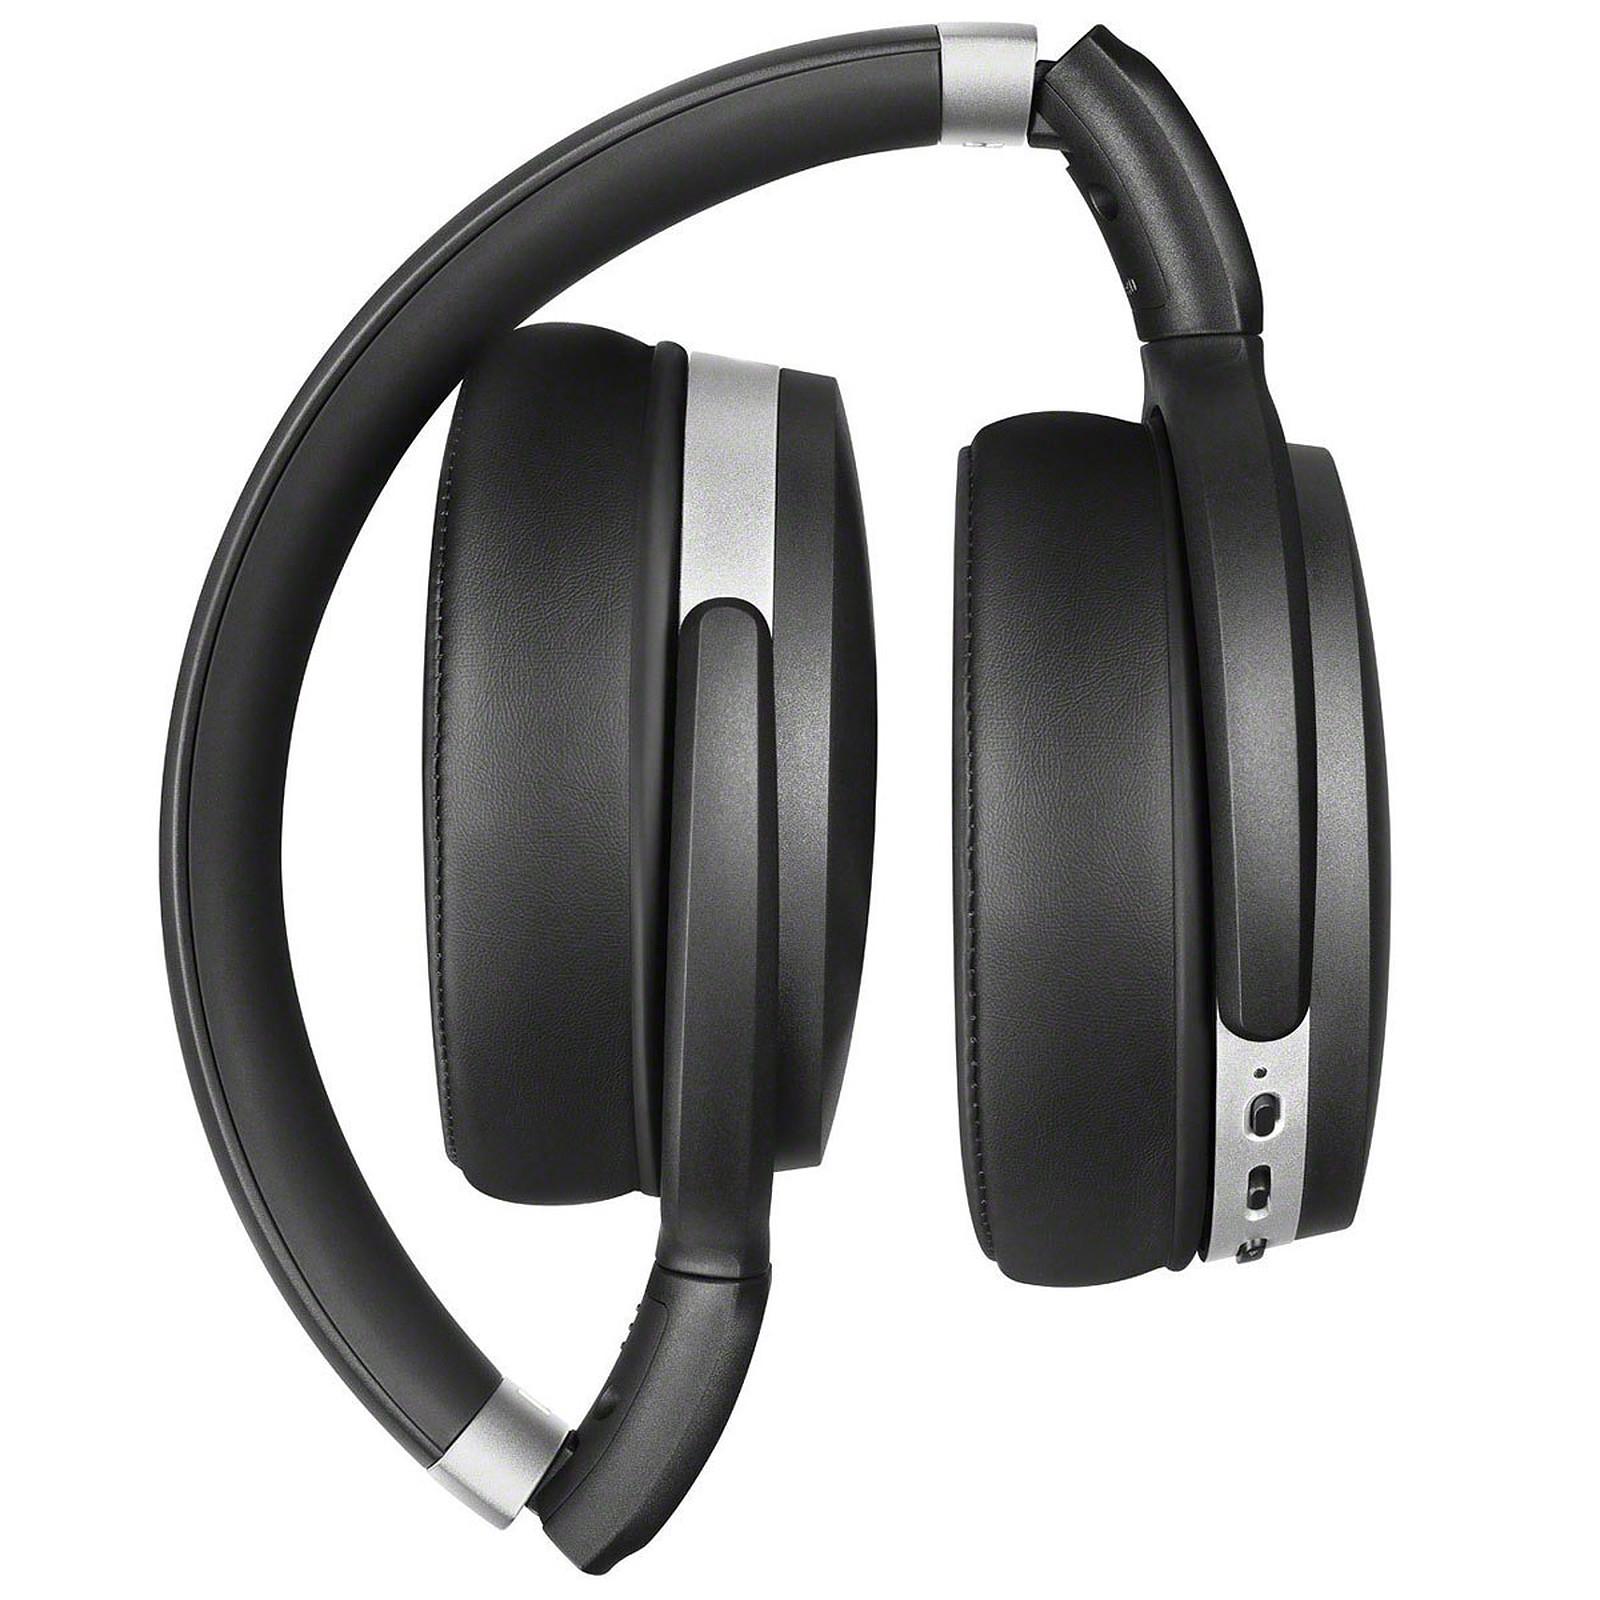 Sennheiser HD 4.50 BTNC Wireless Auriculares Sennheiser en